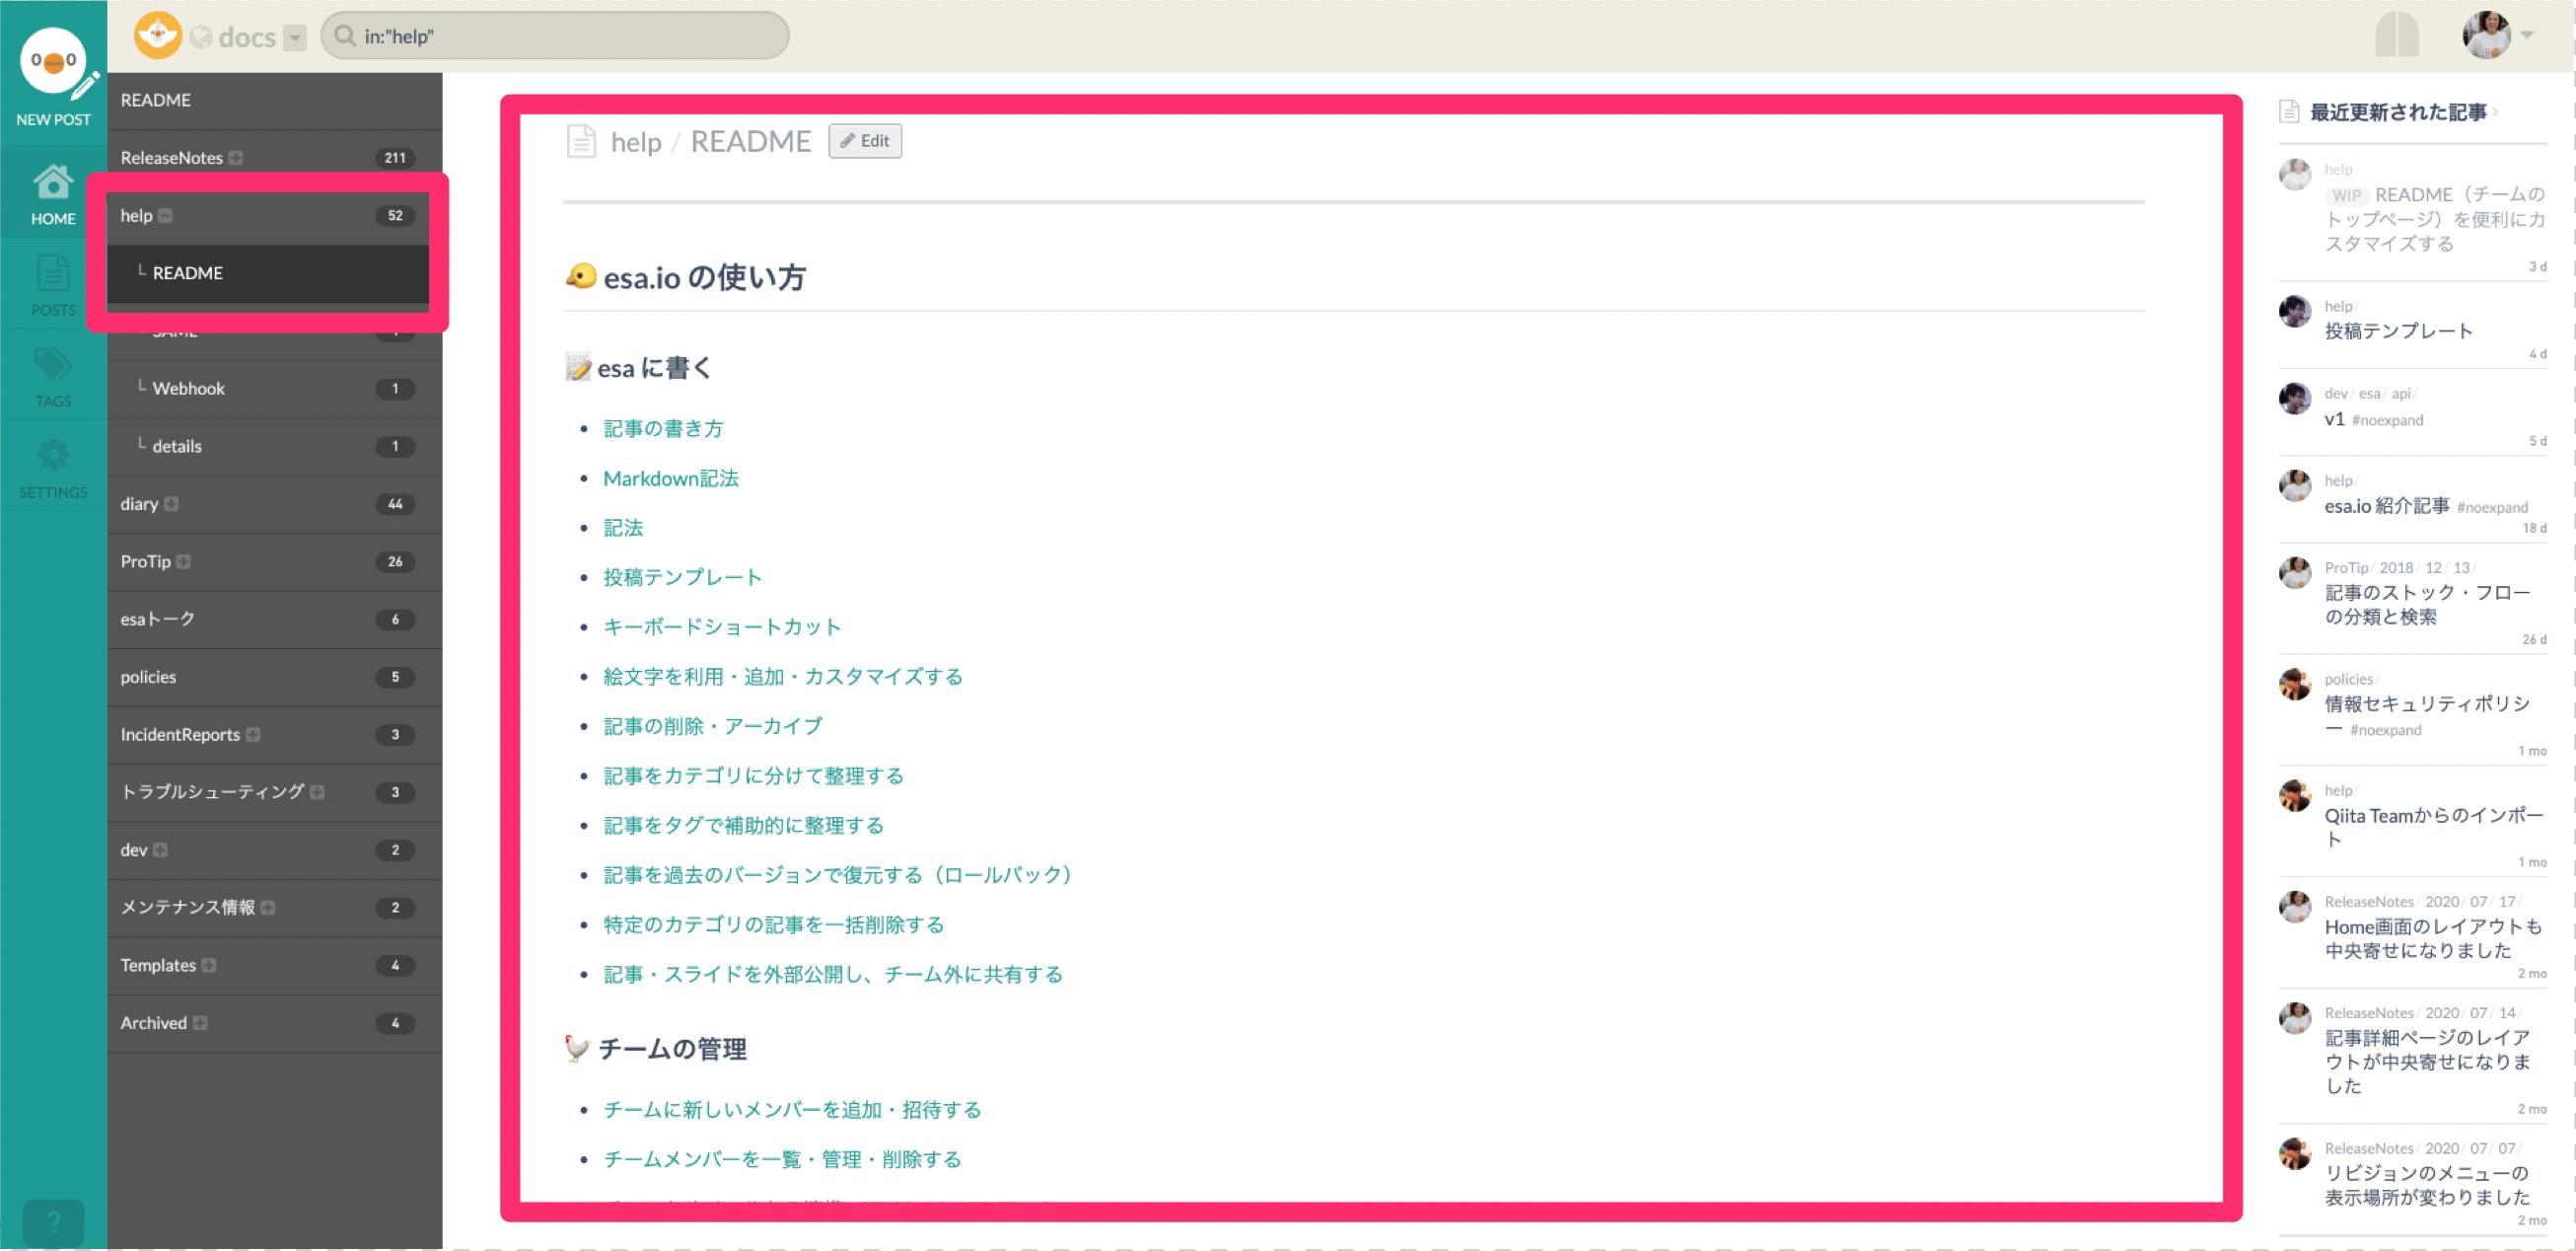 image.png (1.3 MB)